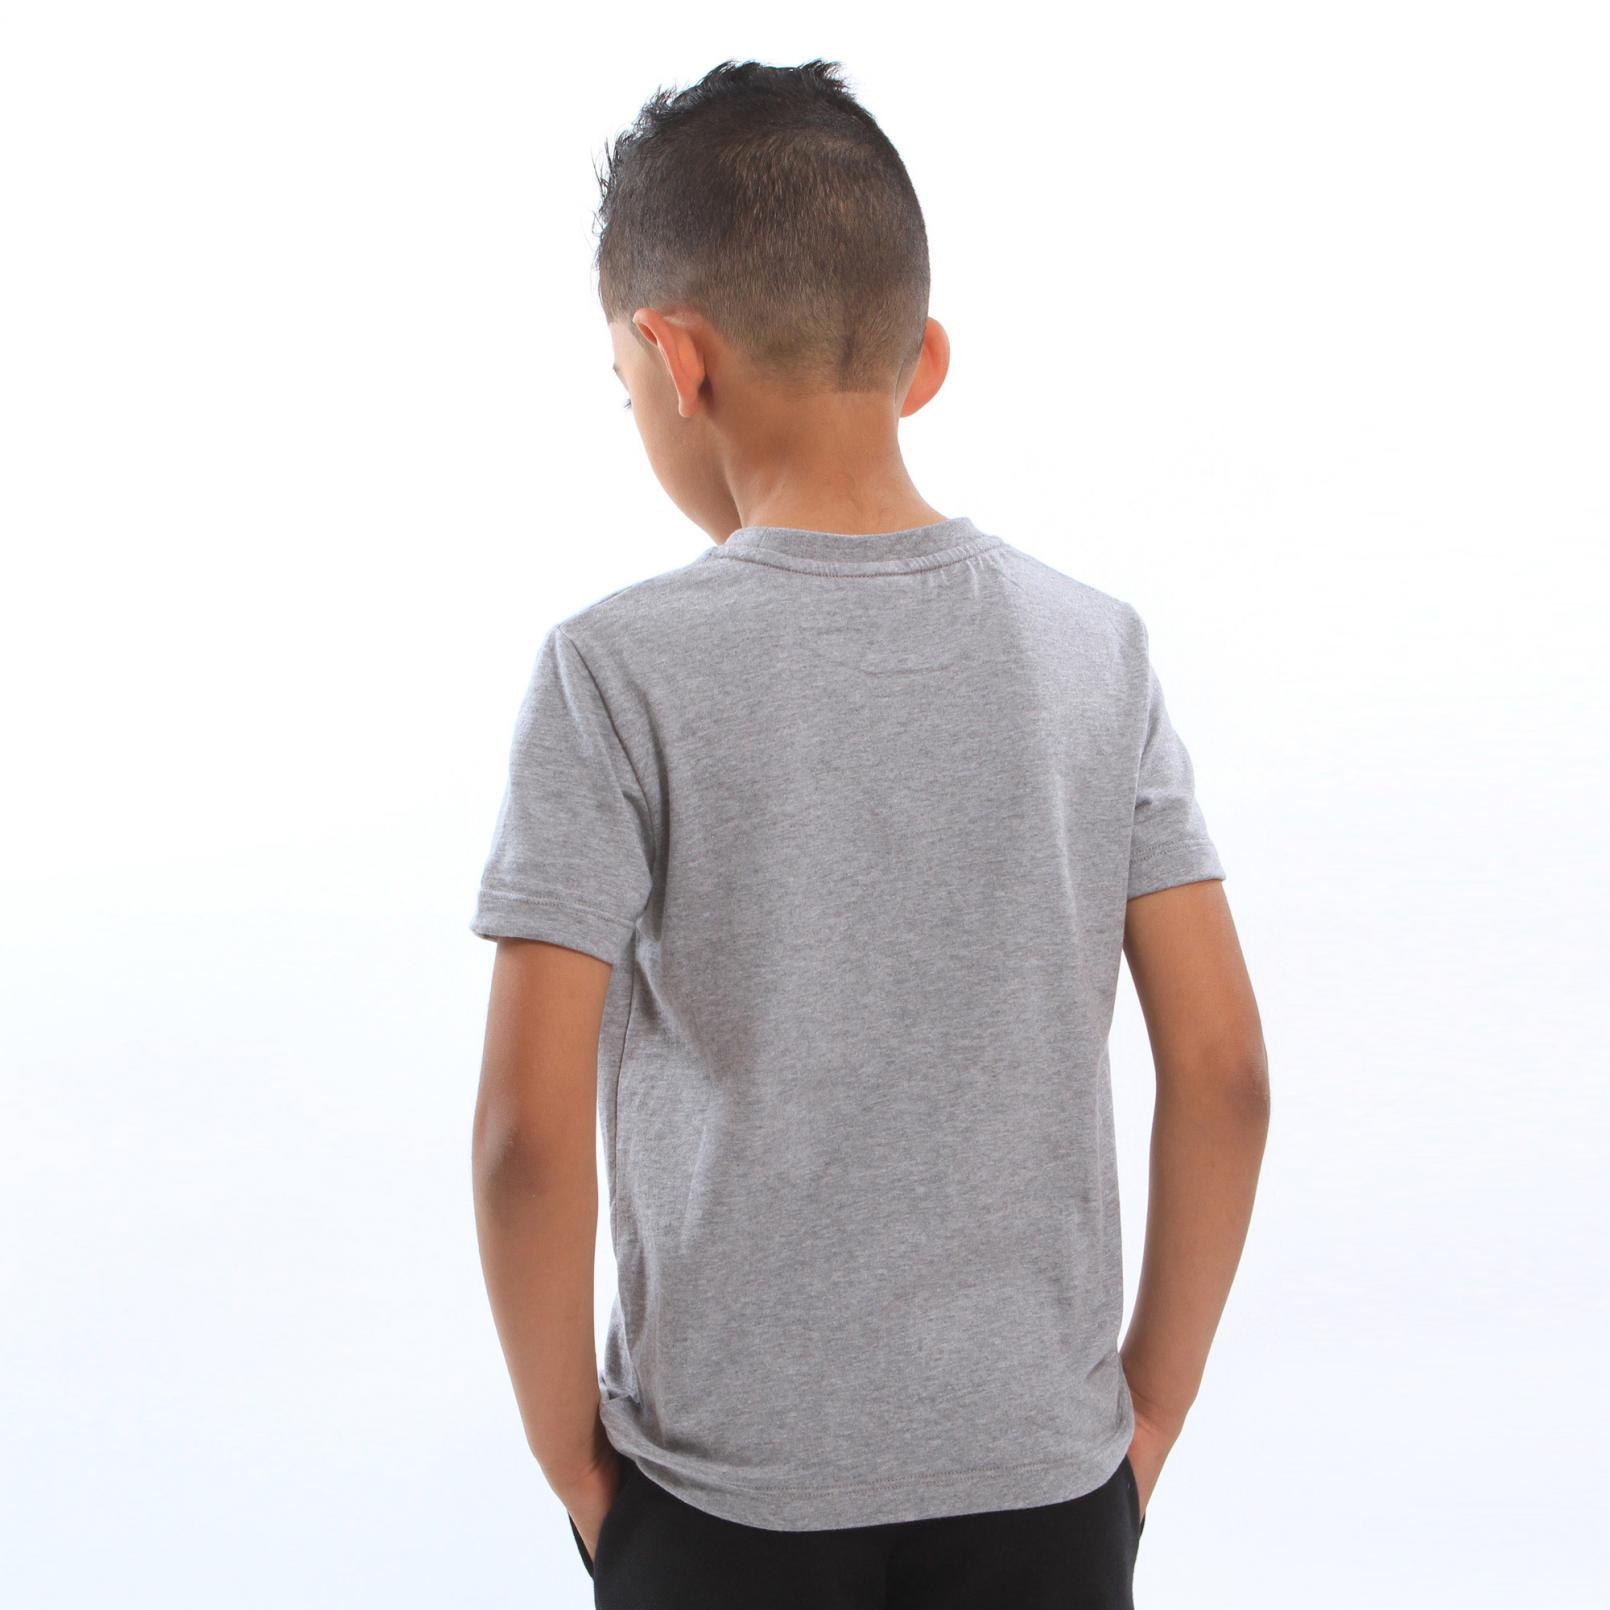 Kids Apparel – Le Coq Sportif Essentiels T-shirt Grey